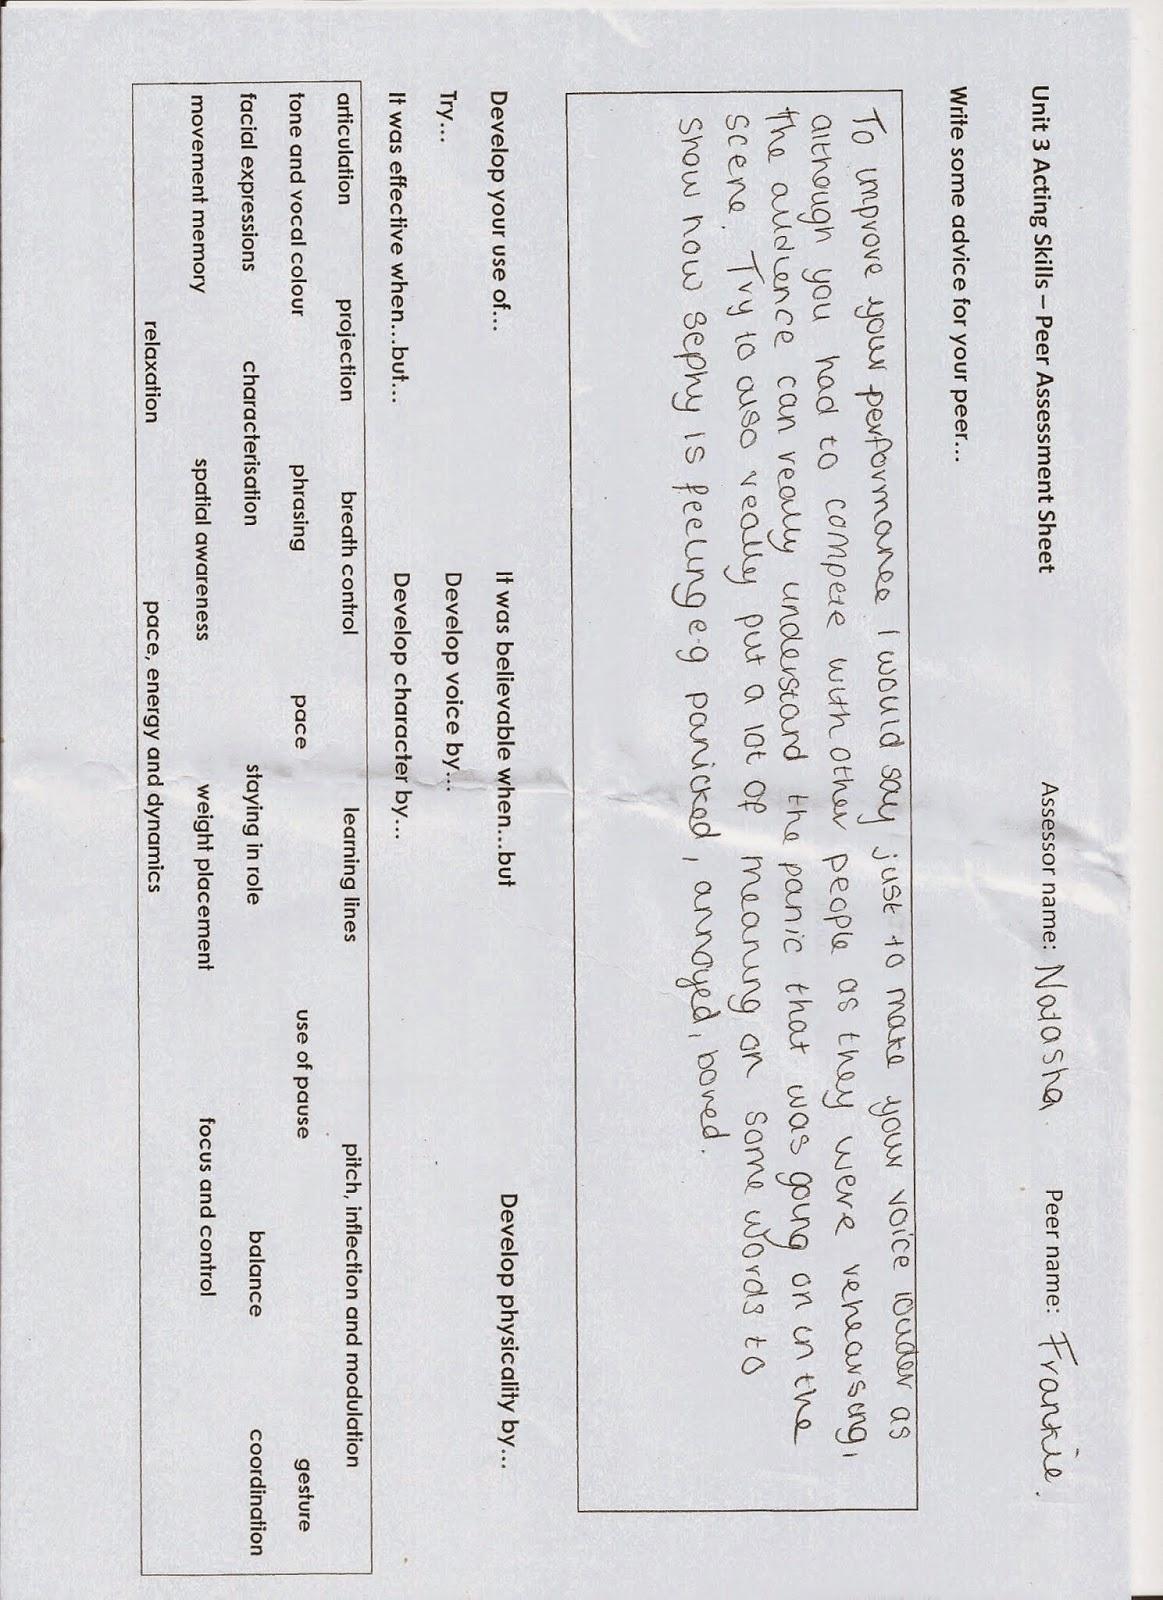 Unit 3 Acting Skills: Peer Assessment Sheet